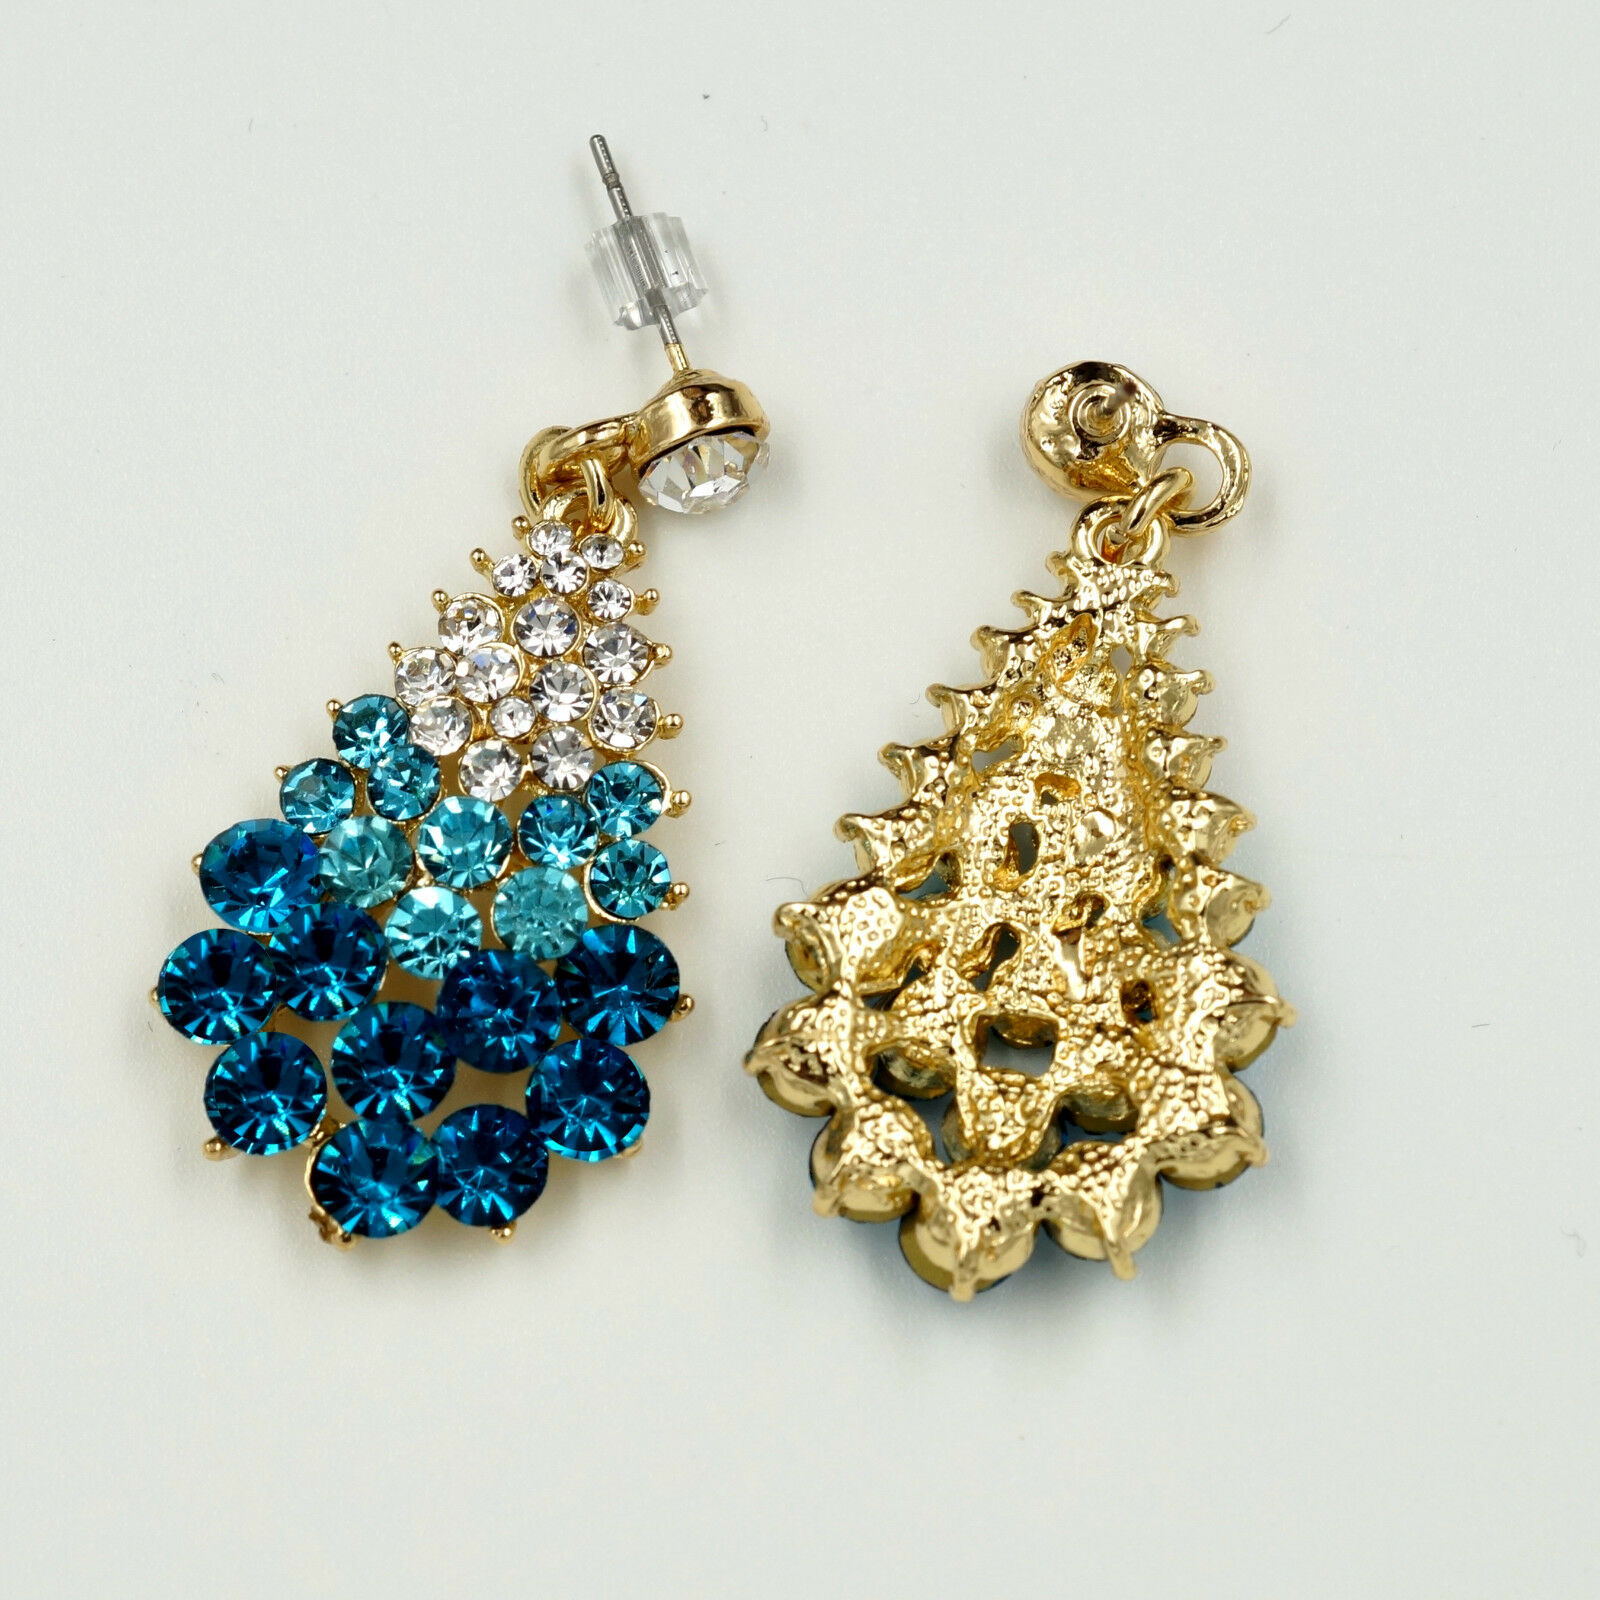 New 18K Gold Plated GP Blue Crystal Rhinestone Drop Dangle Earrings 00841